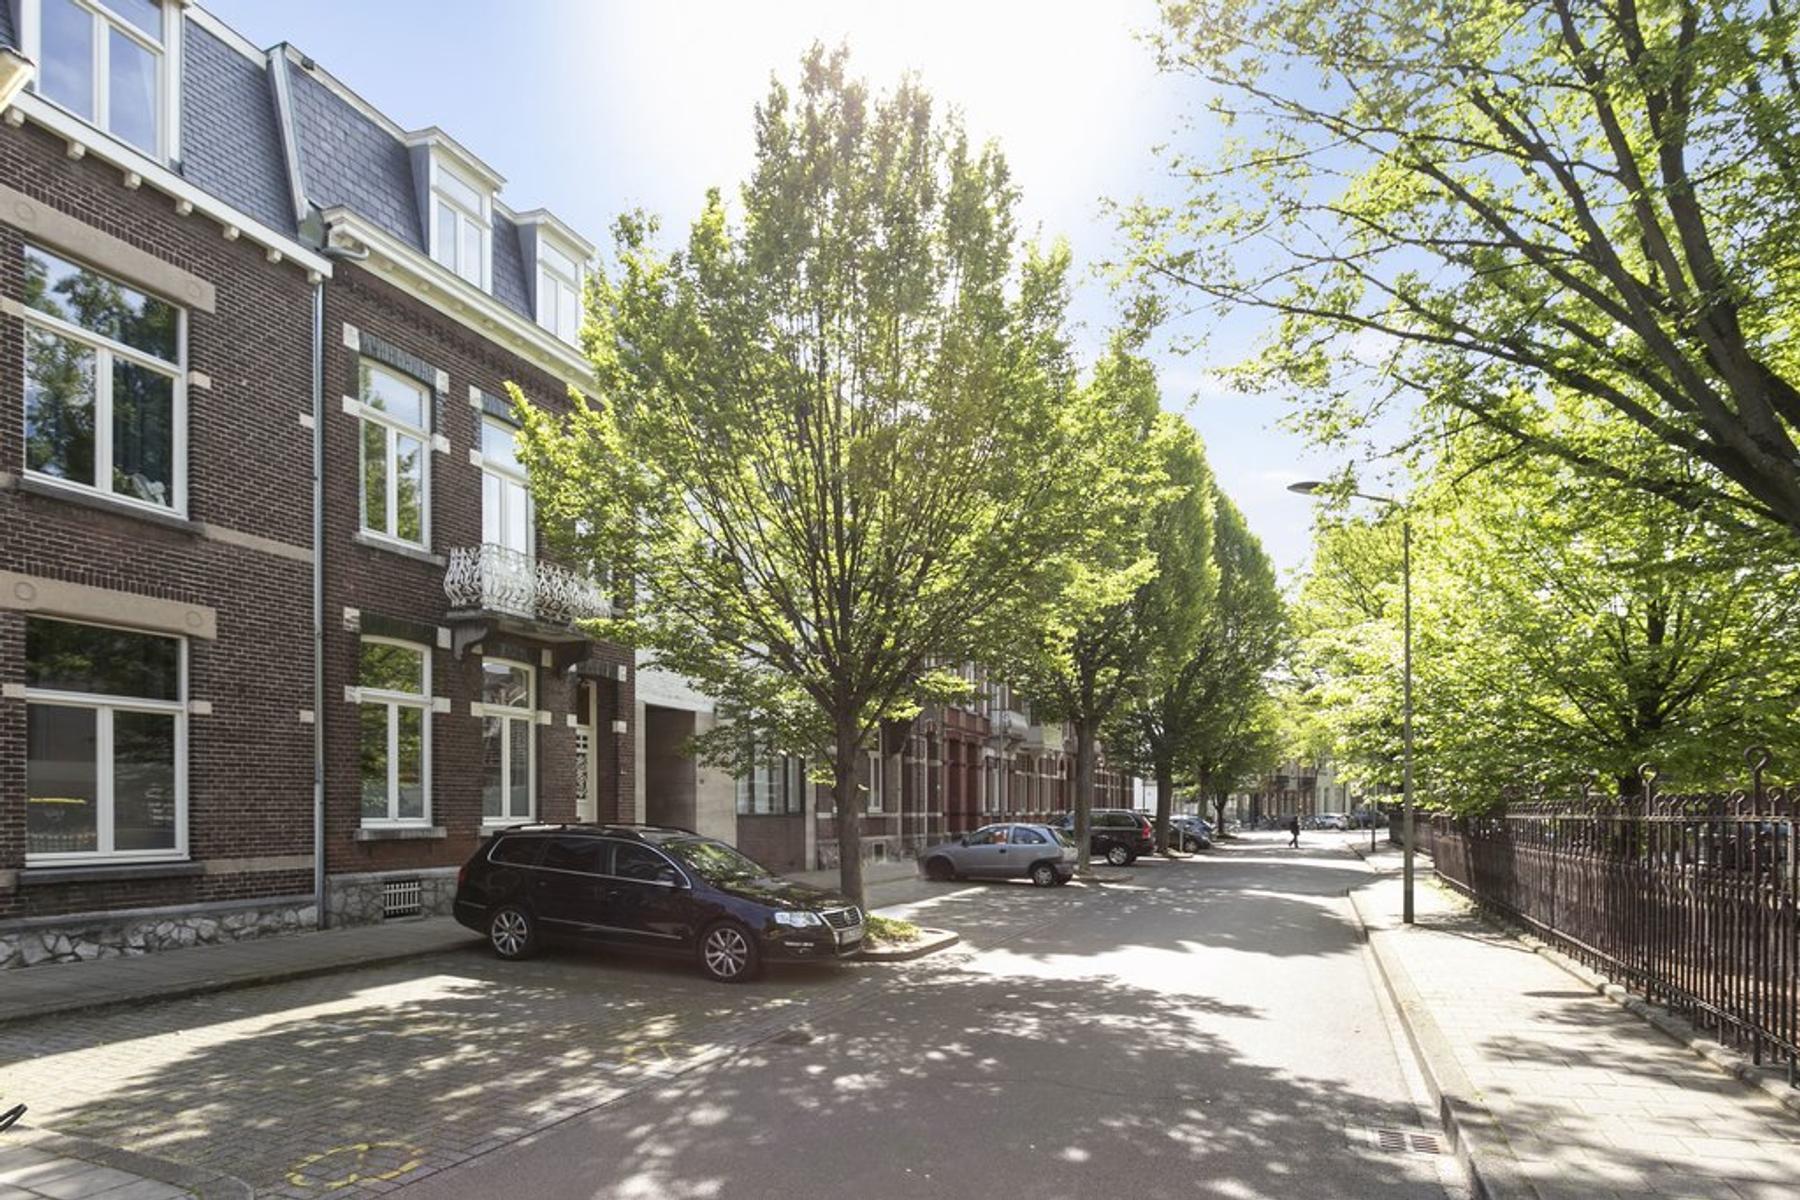 Turennestraat 23 in Maastricht 6221 AR